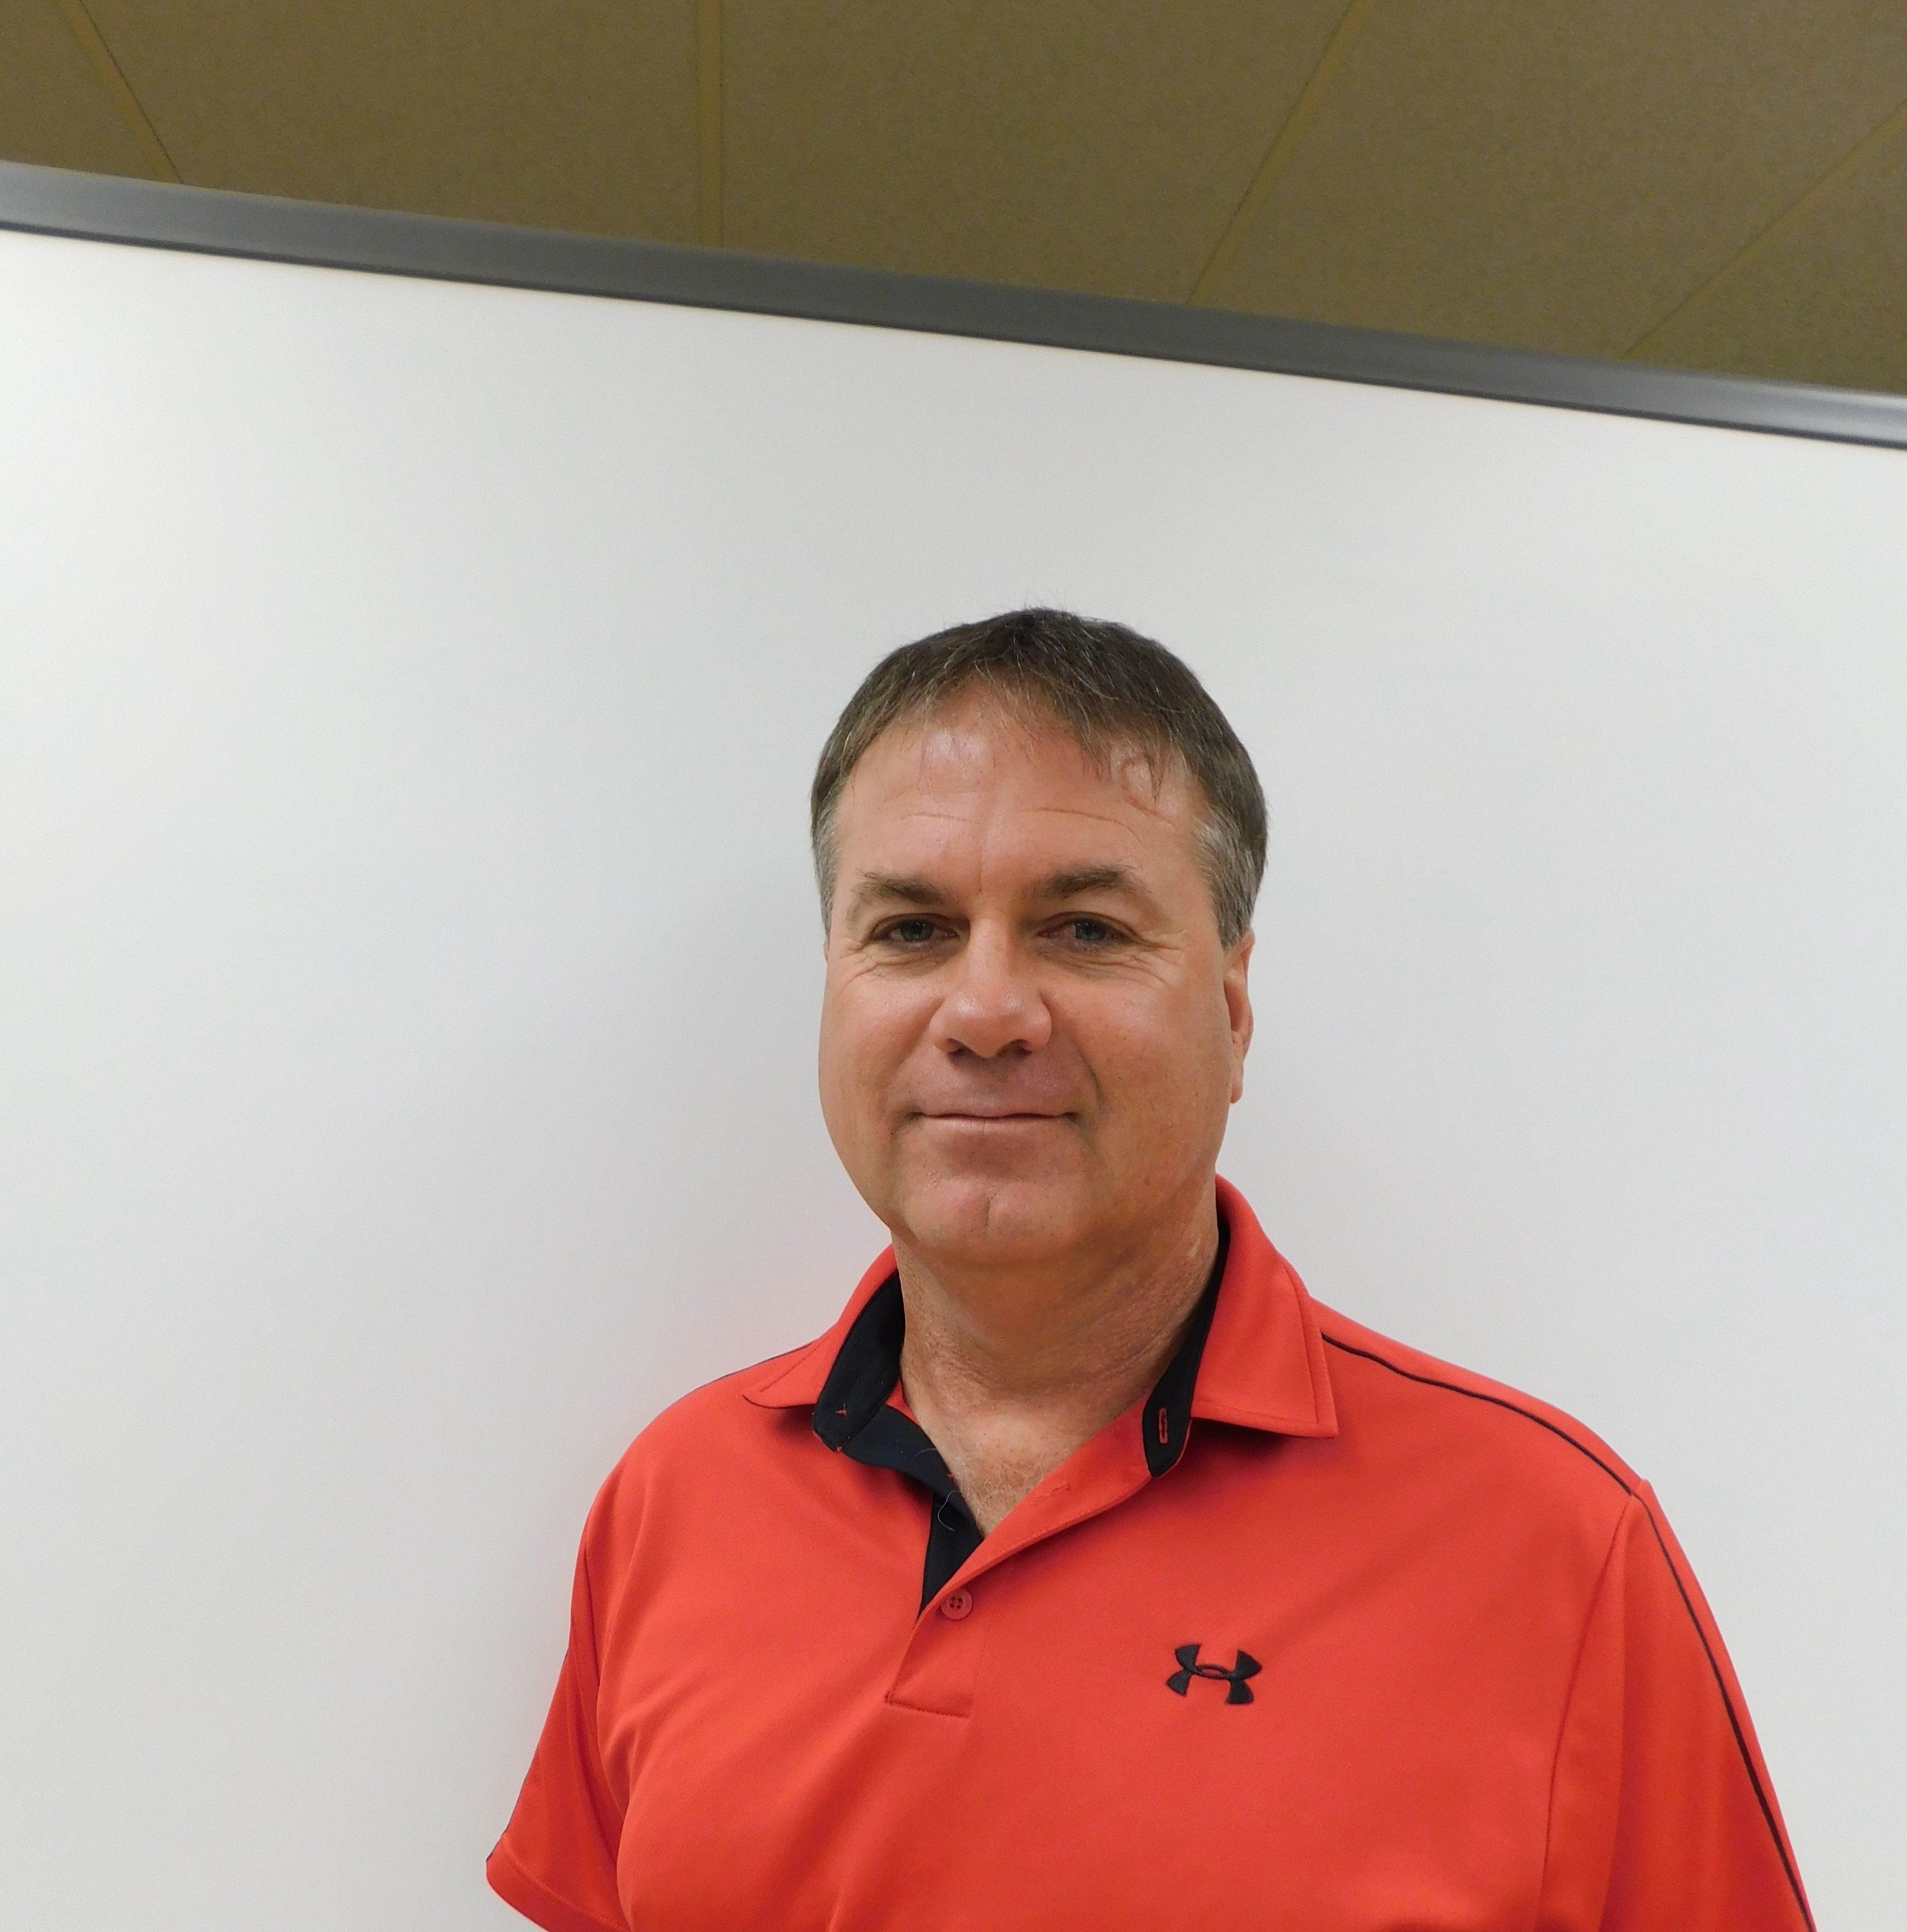 Coach optimistic about rebuilding Port Barre team